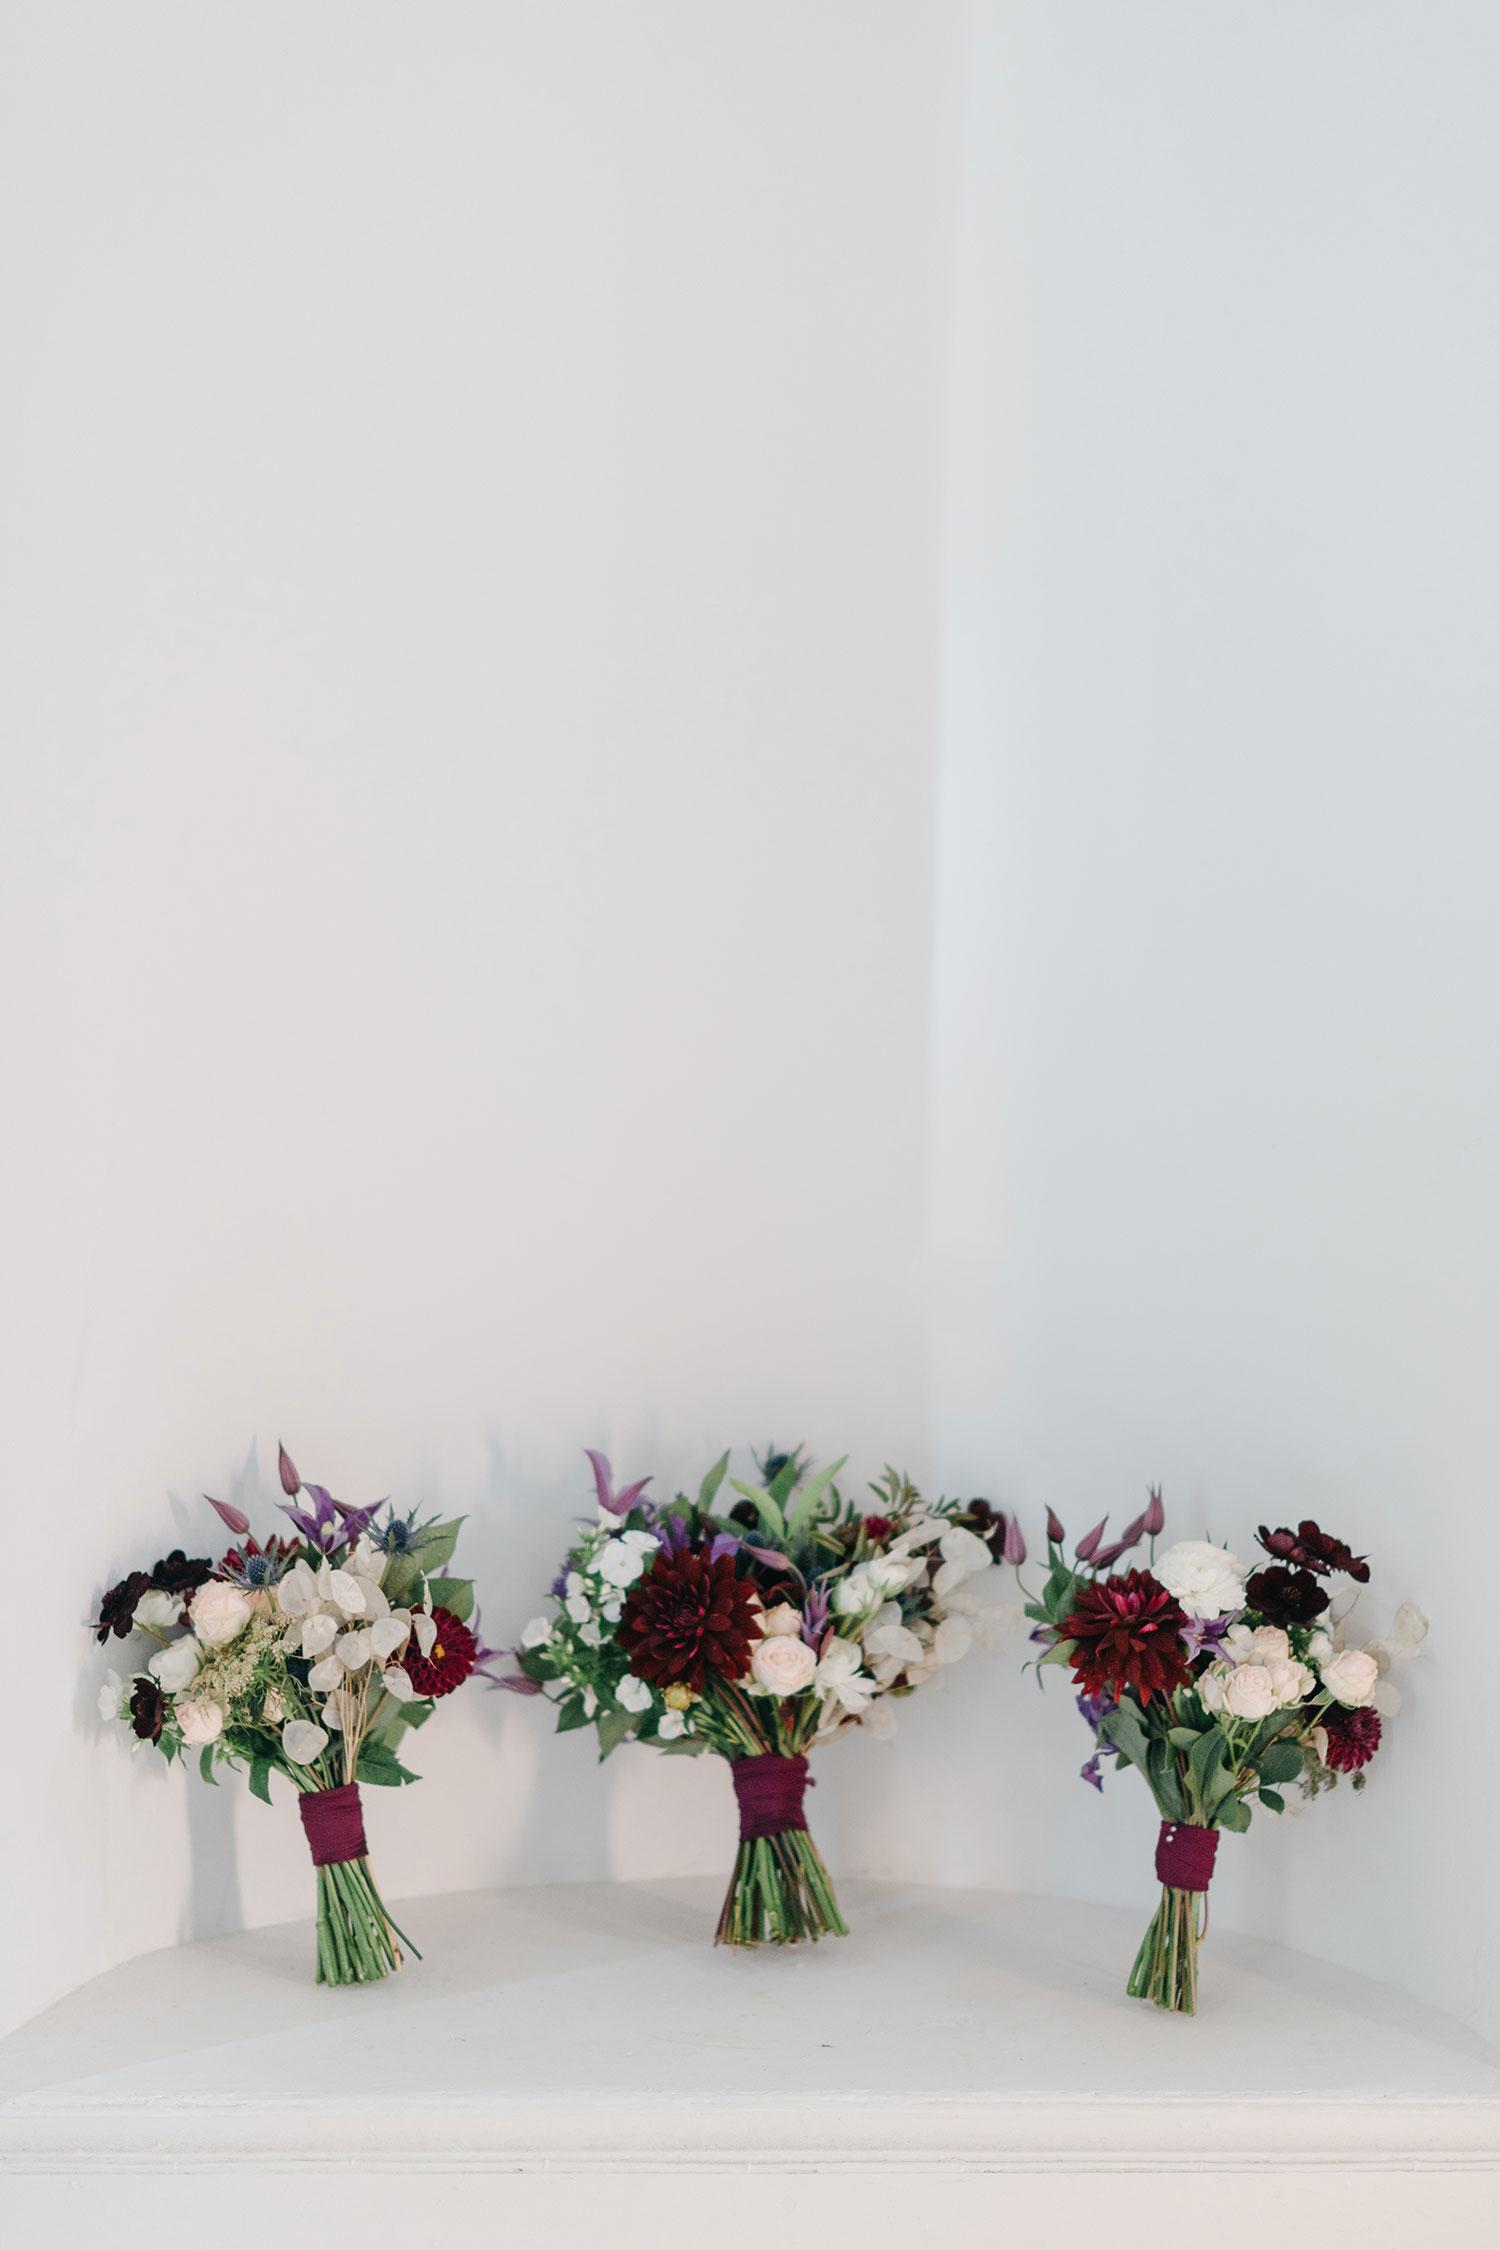 bellinter-house-wedding-photographer-0009_0009.jpg